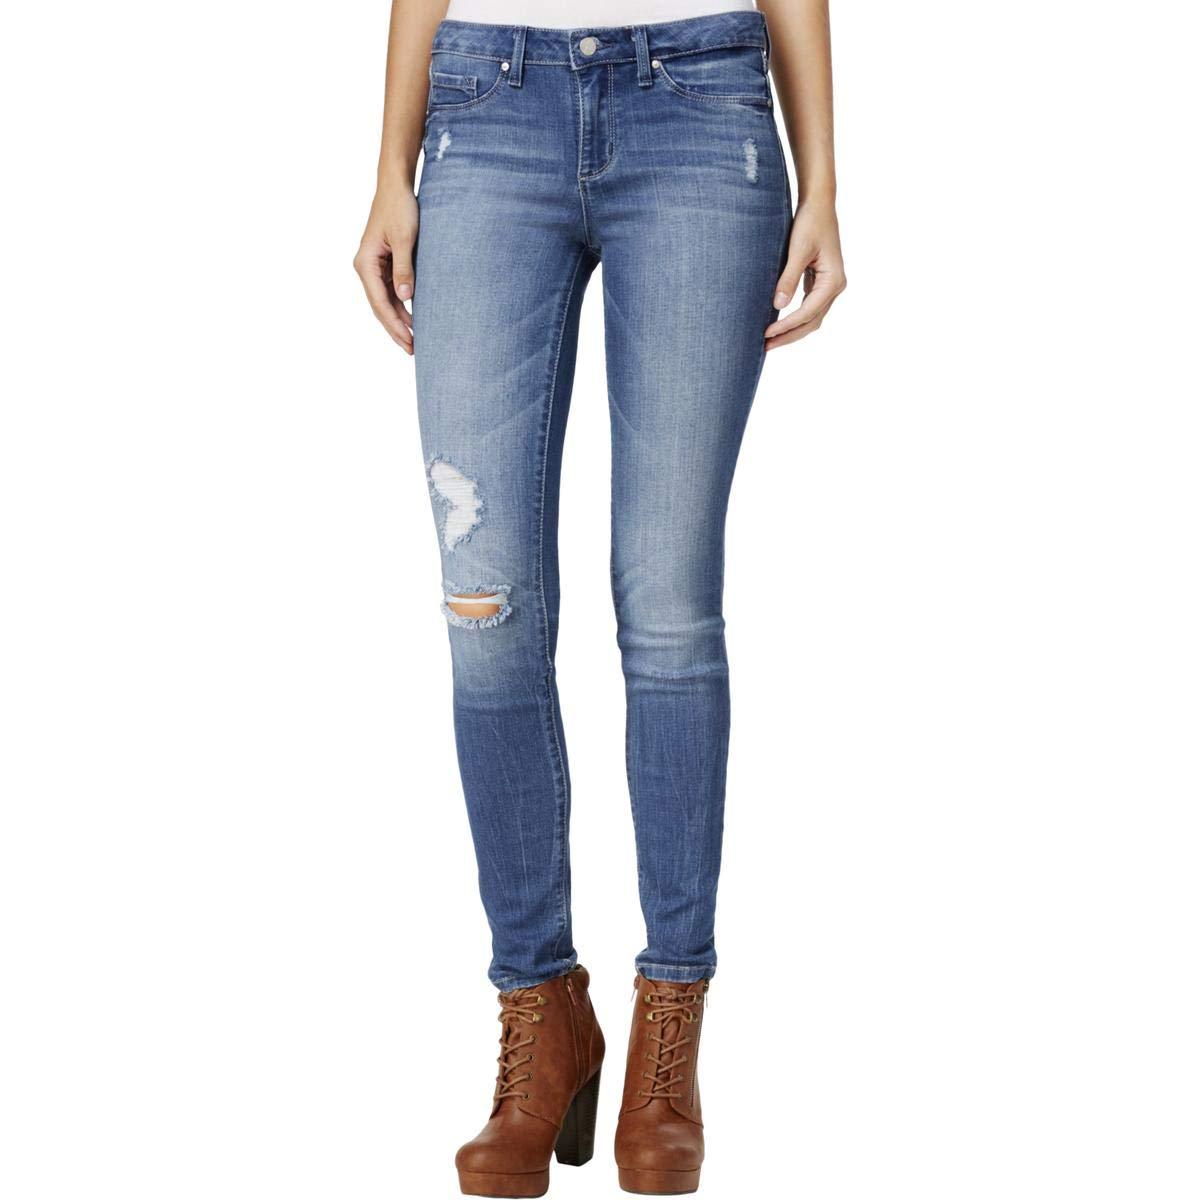 Jessica Simpson Womens Kiss Me Distressed Casual Skinny Pants Denim 26